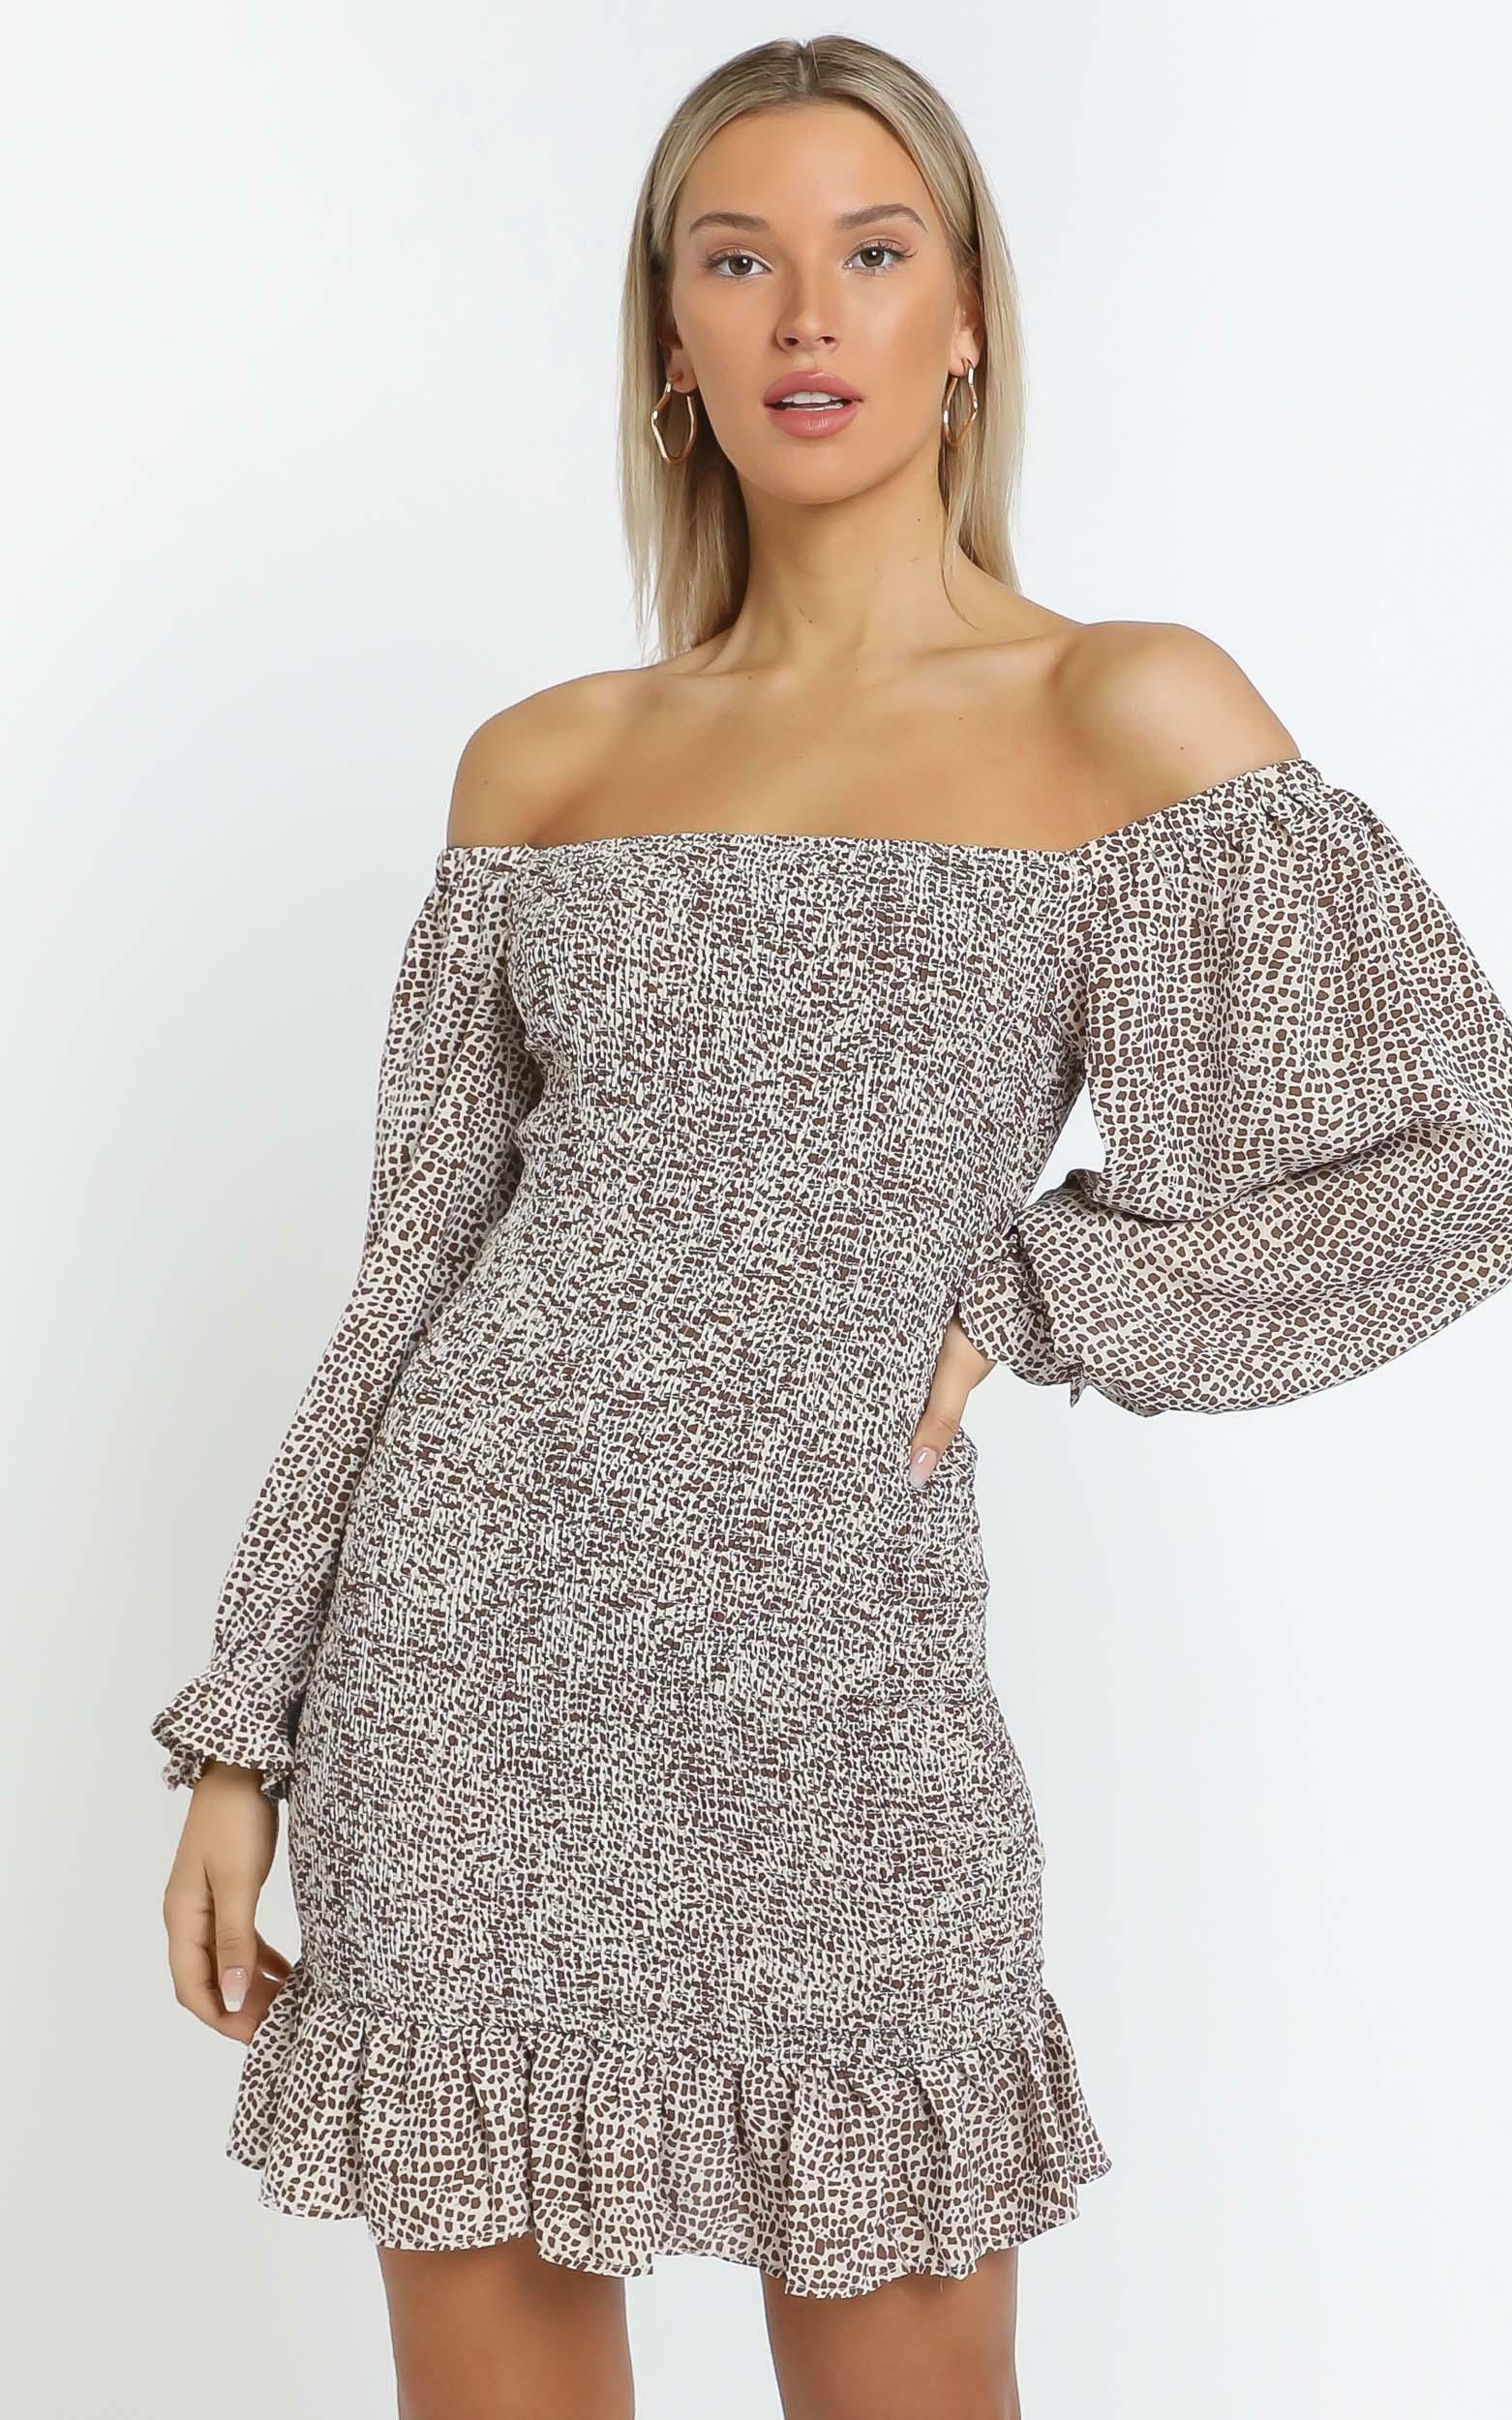 Meg Dress in Choc Spot - 14 (XL), BRN1, hi-res image number null